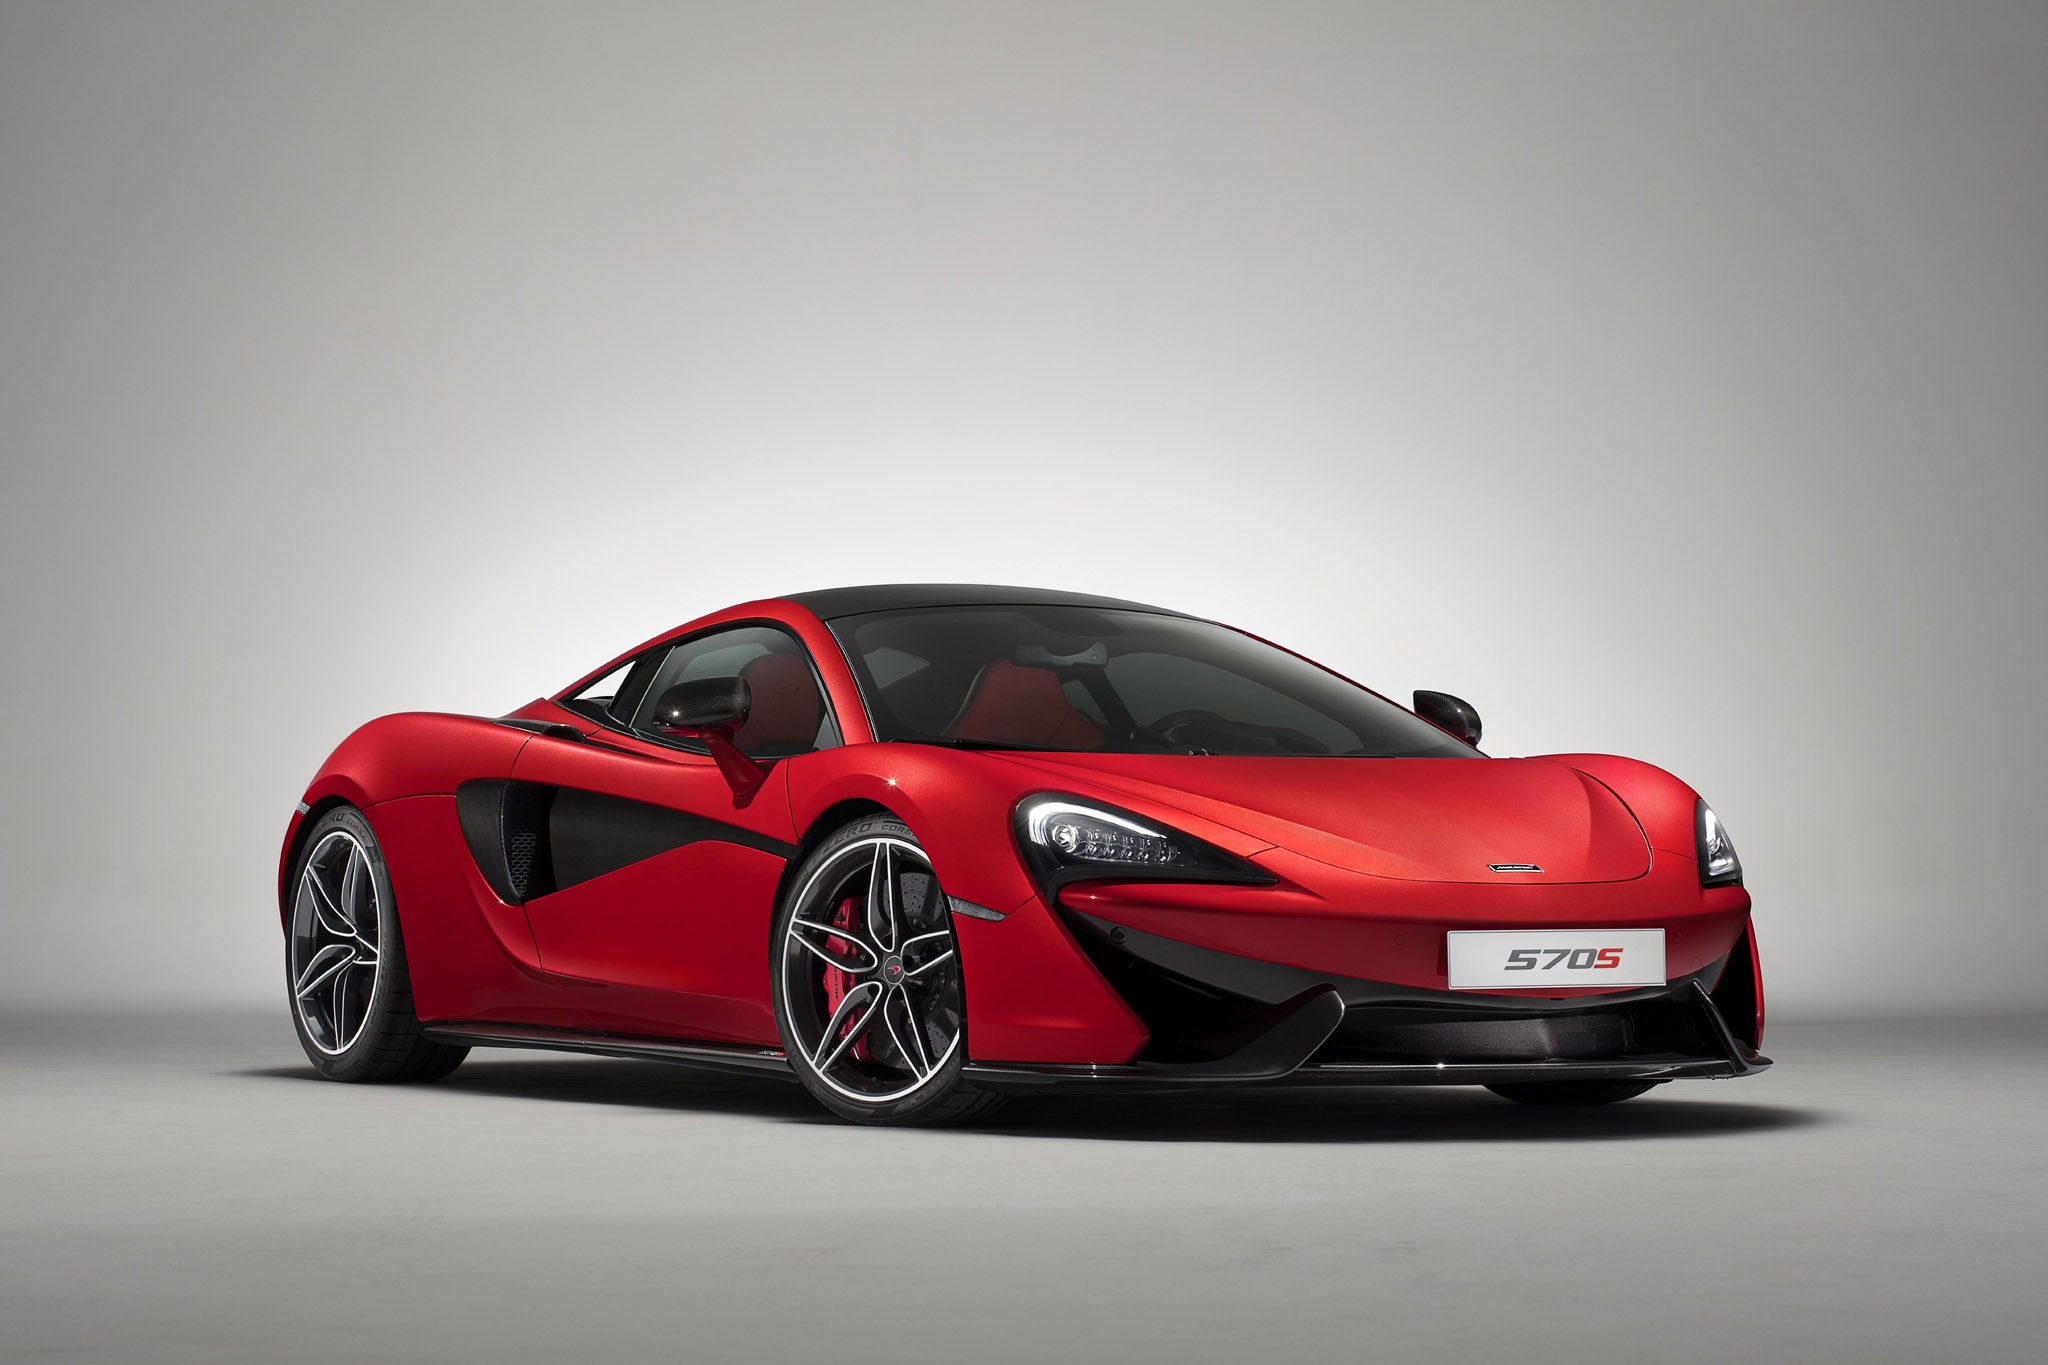 McLaren 570S Special Design Editions Vermillion Red